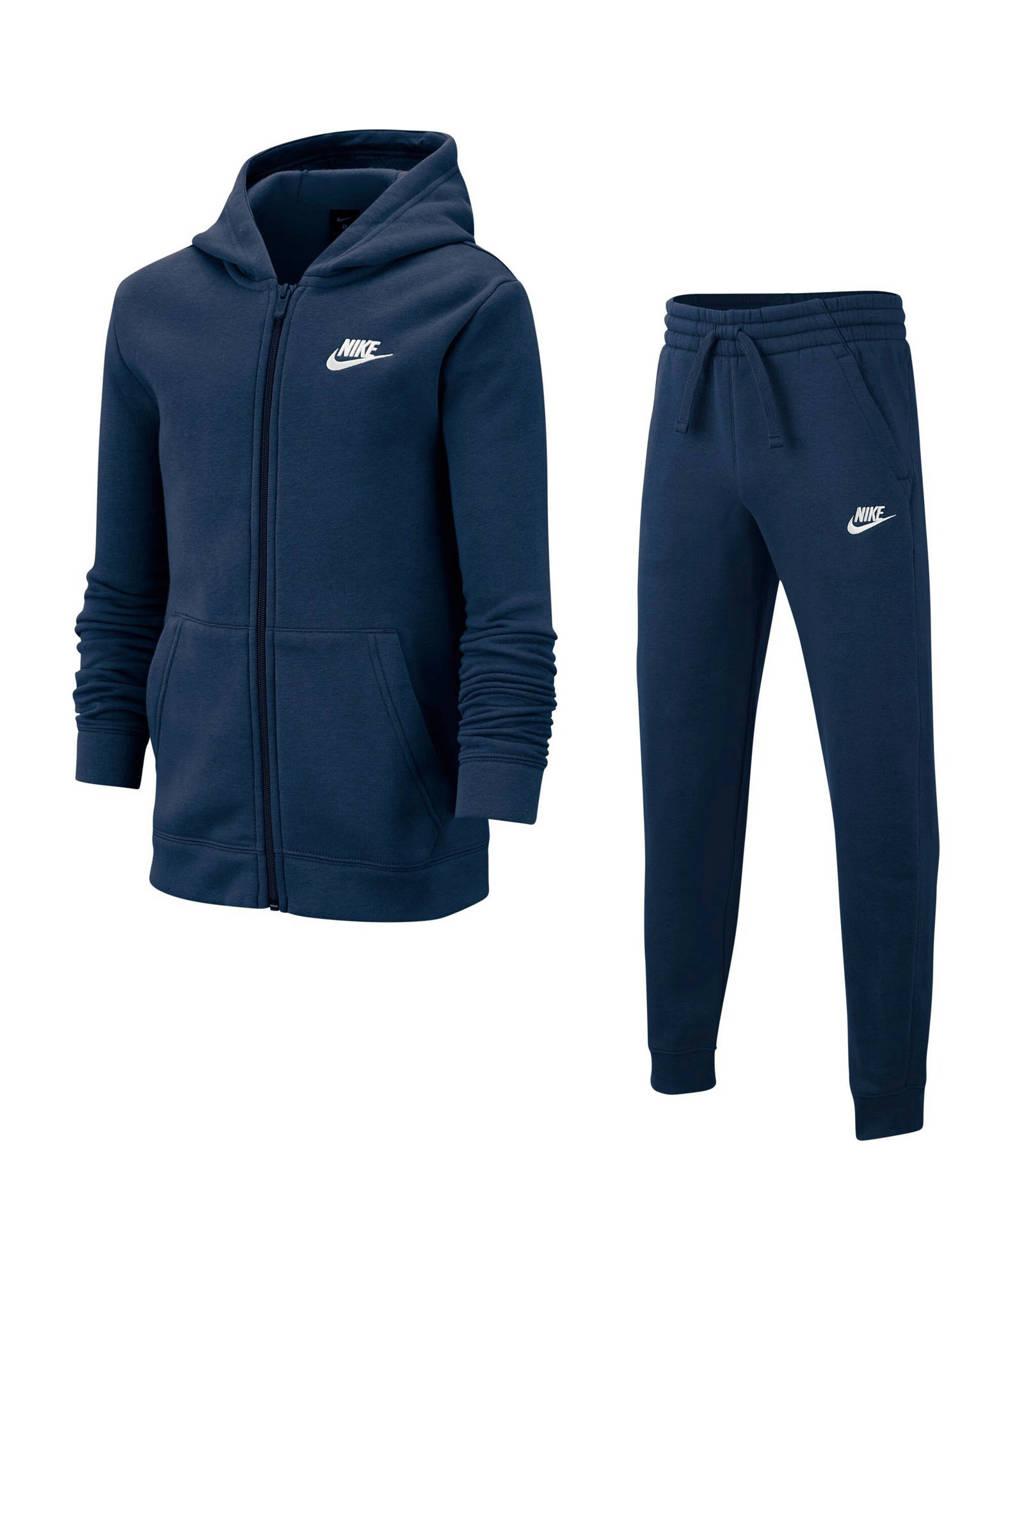 Nike   trainingspak donkerblauw, Donkerblauw/wit